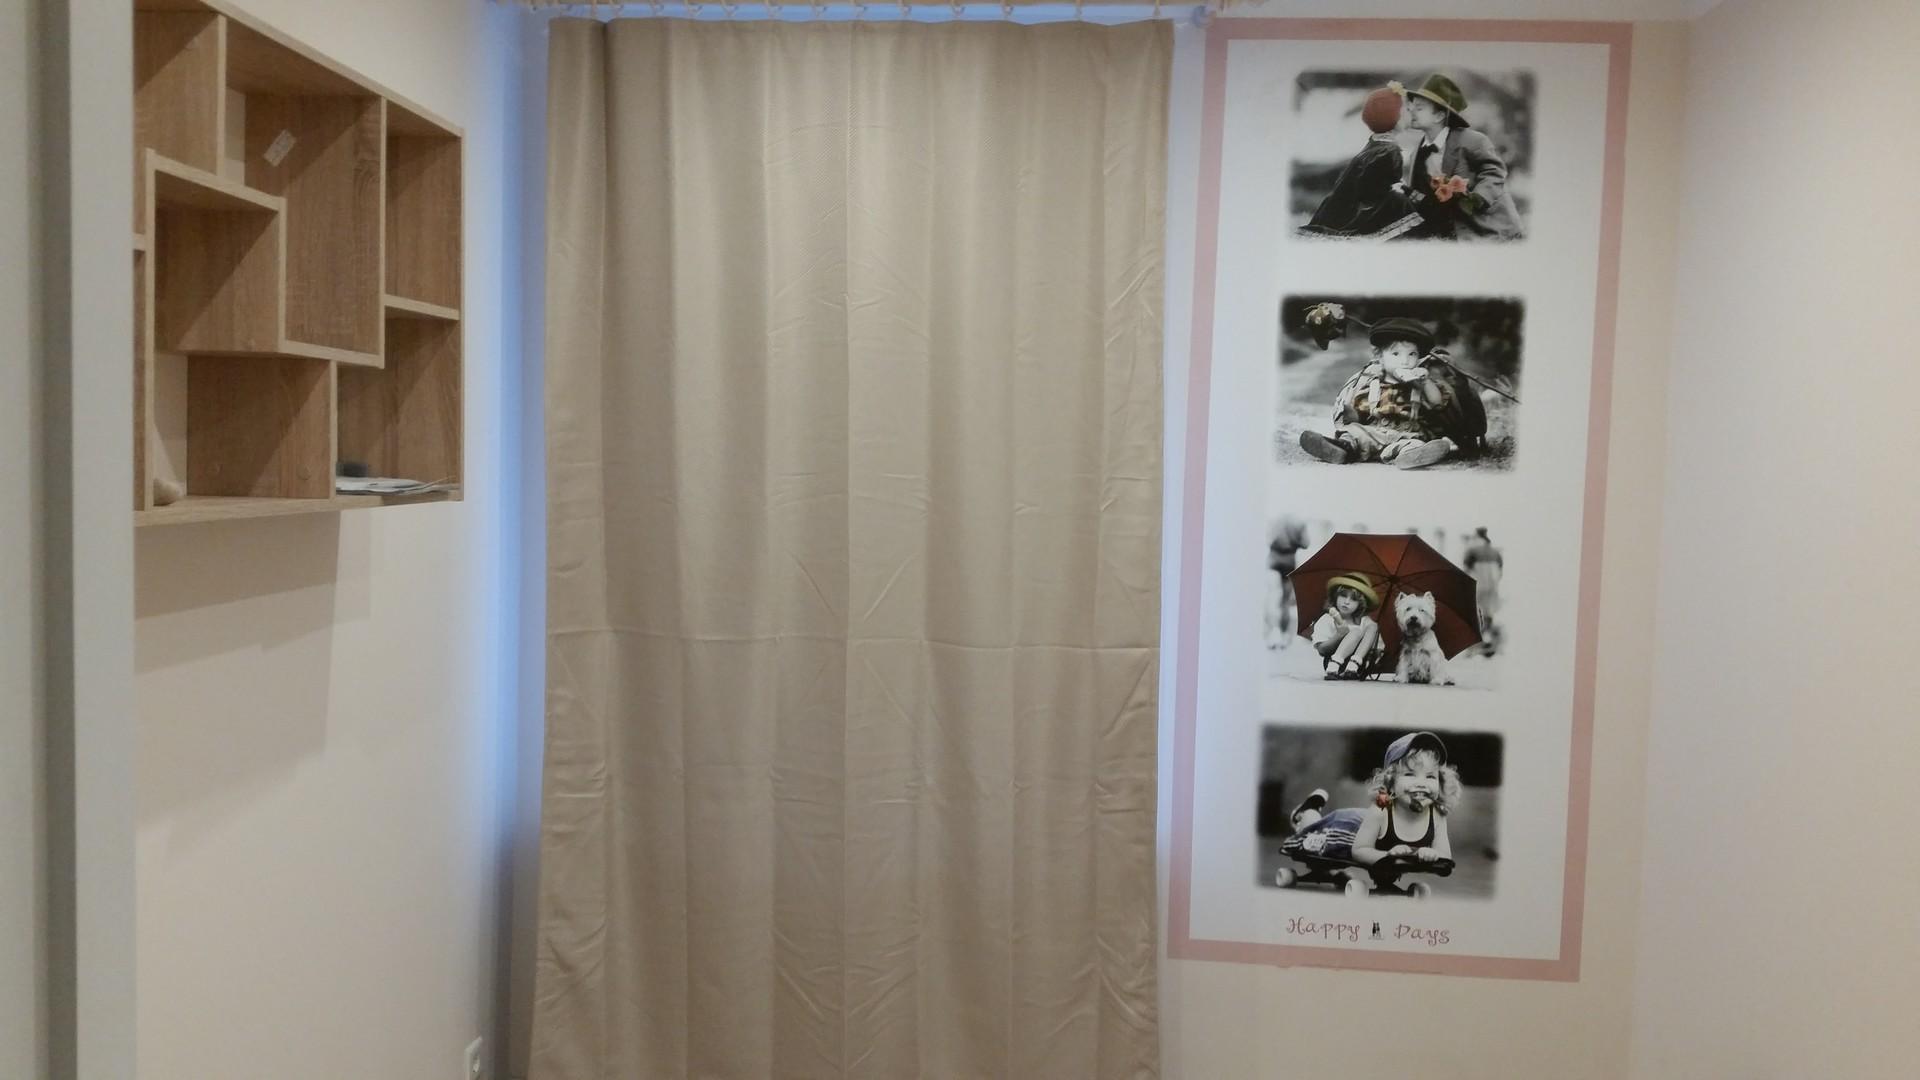 New Sunny Silent Yard 3 room Apart in Riga Center